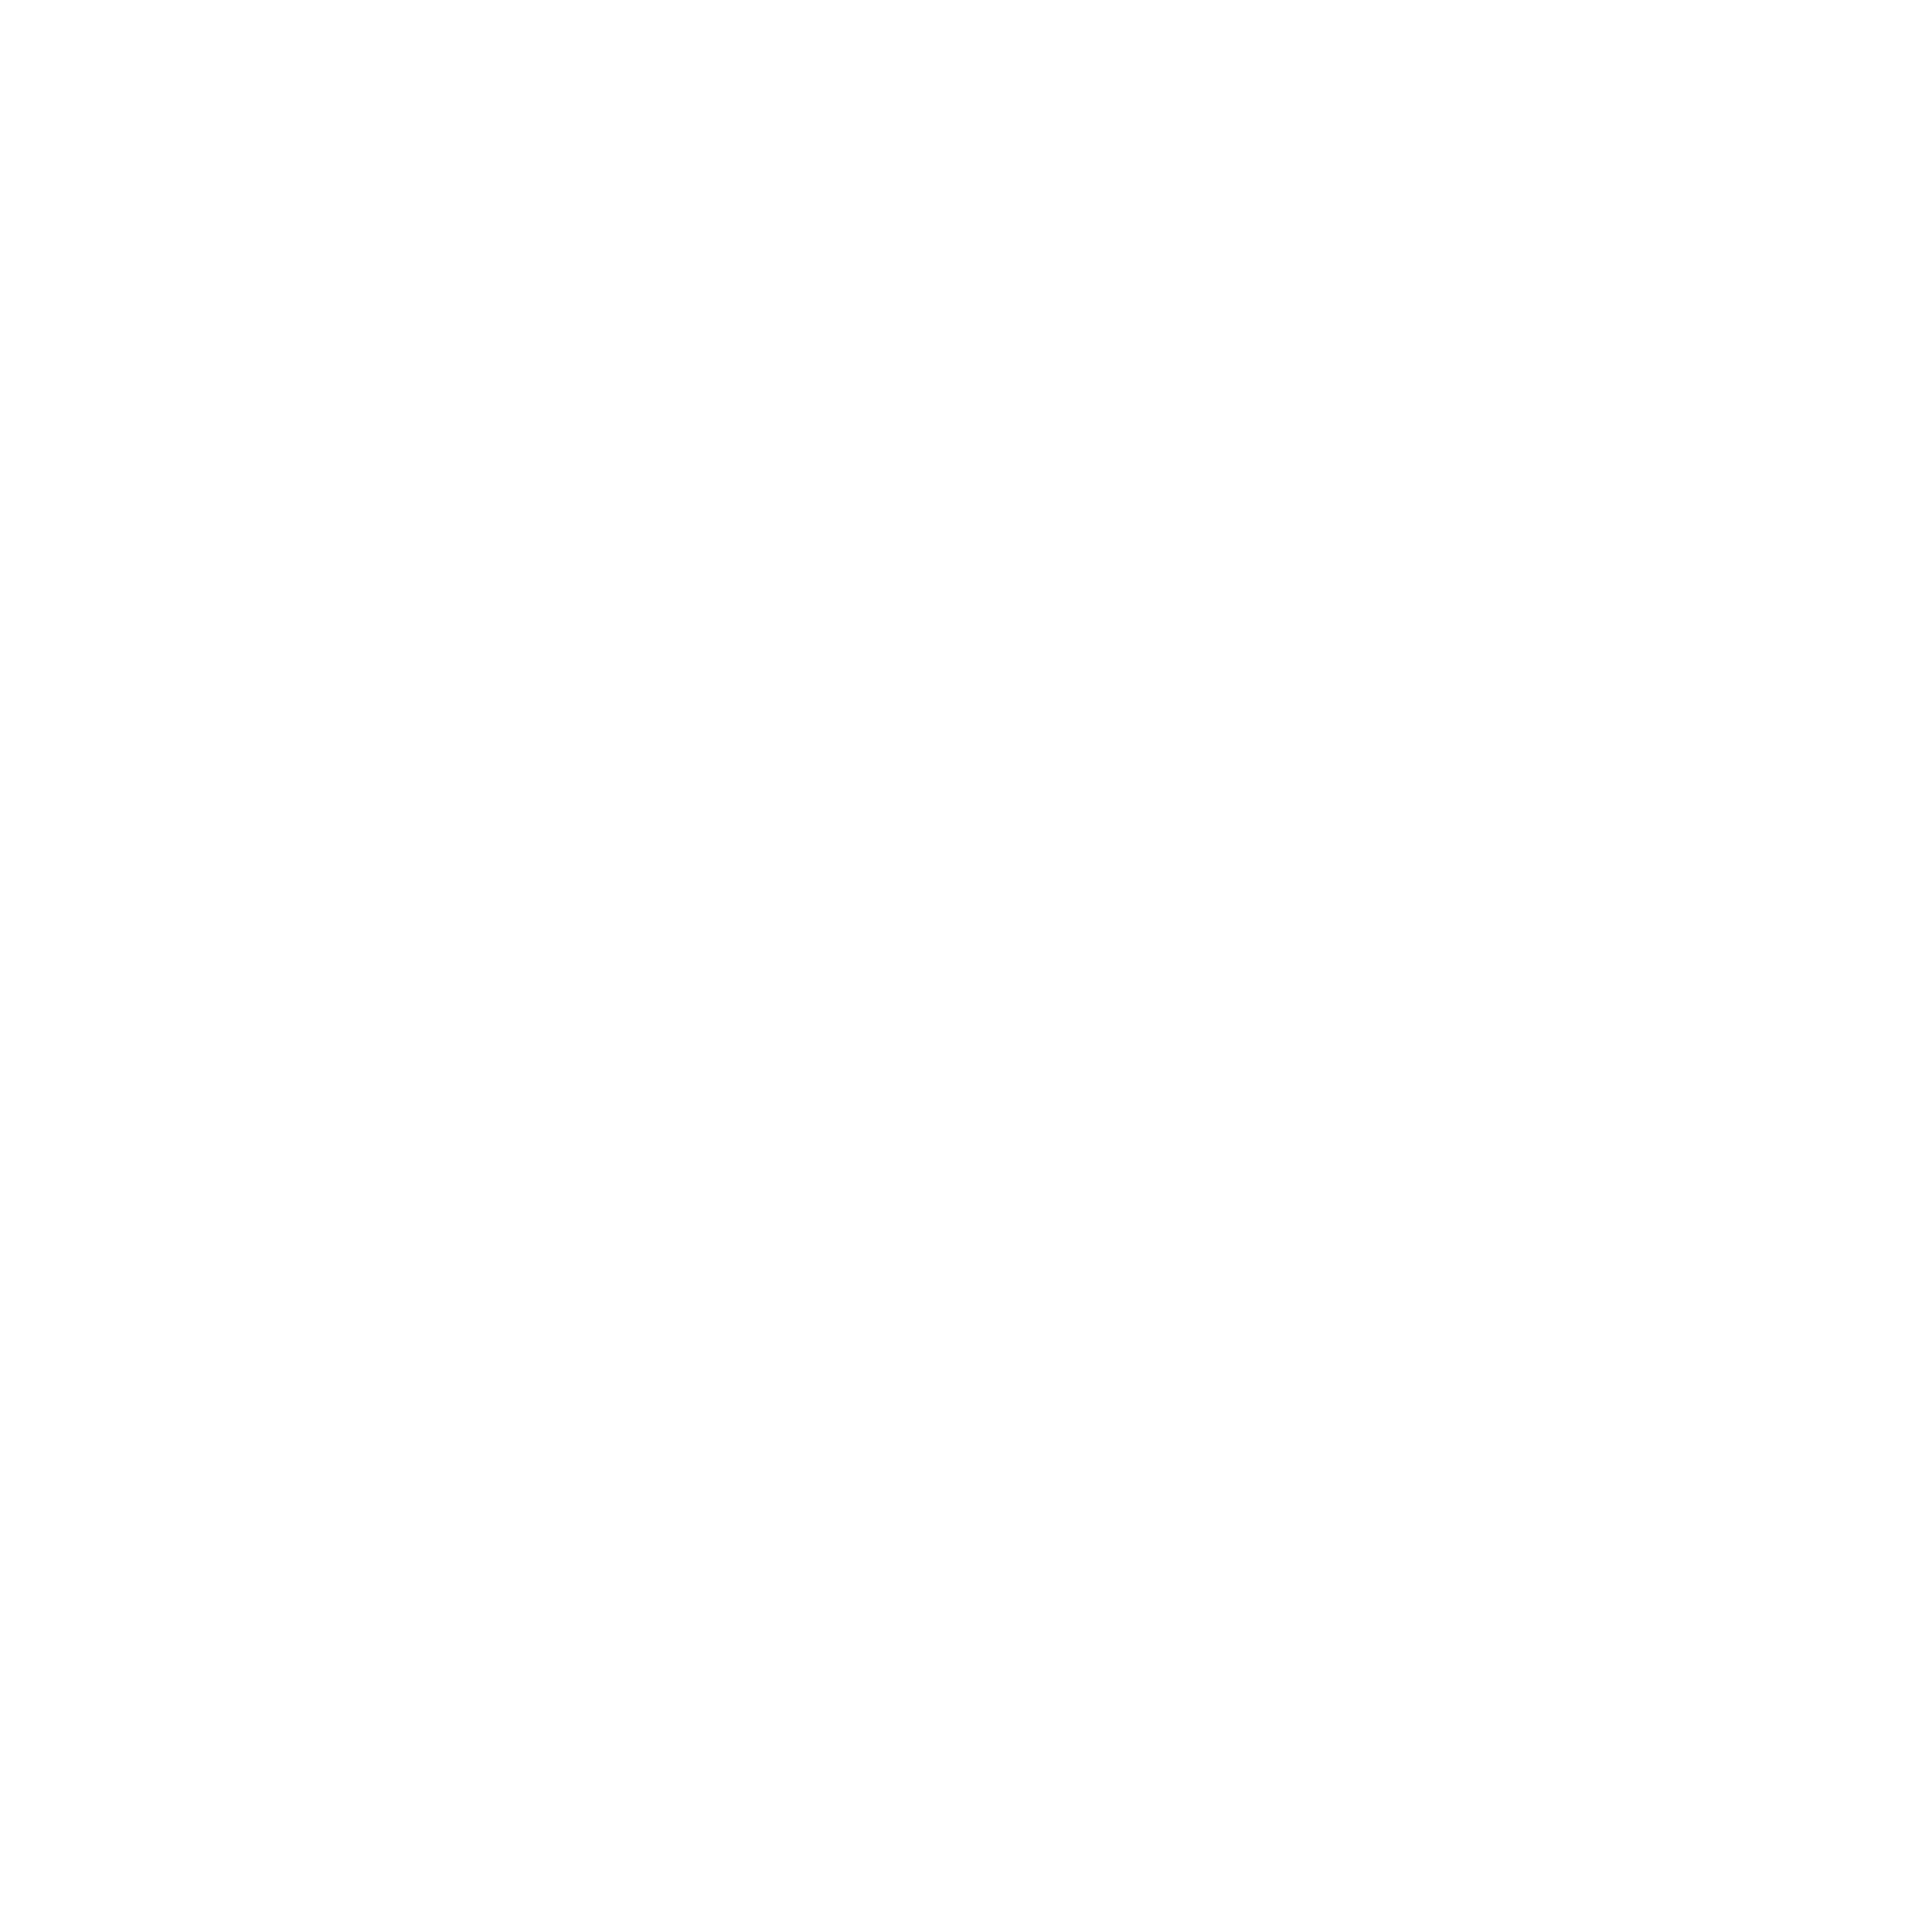 Black And White Google: Google Analytics Logo PNG Transparent & SVG Vector